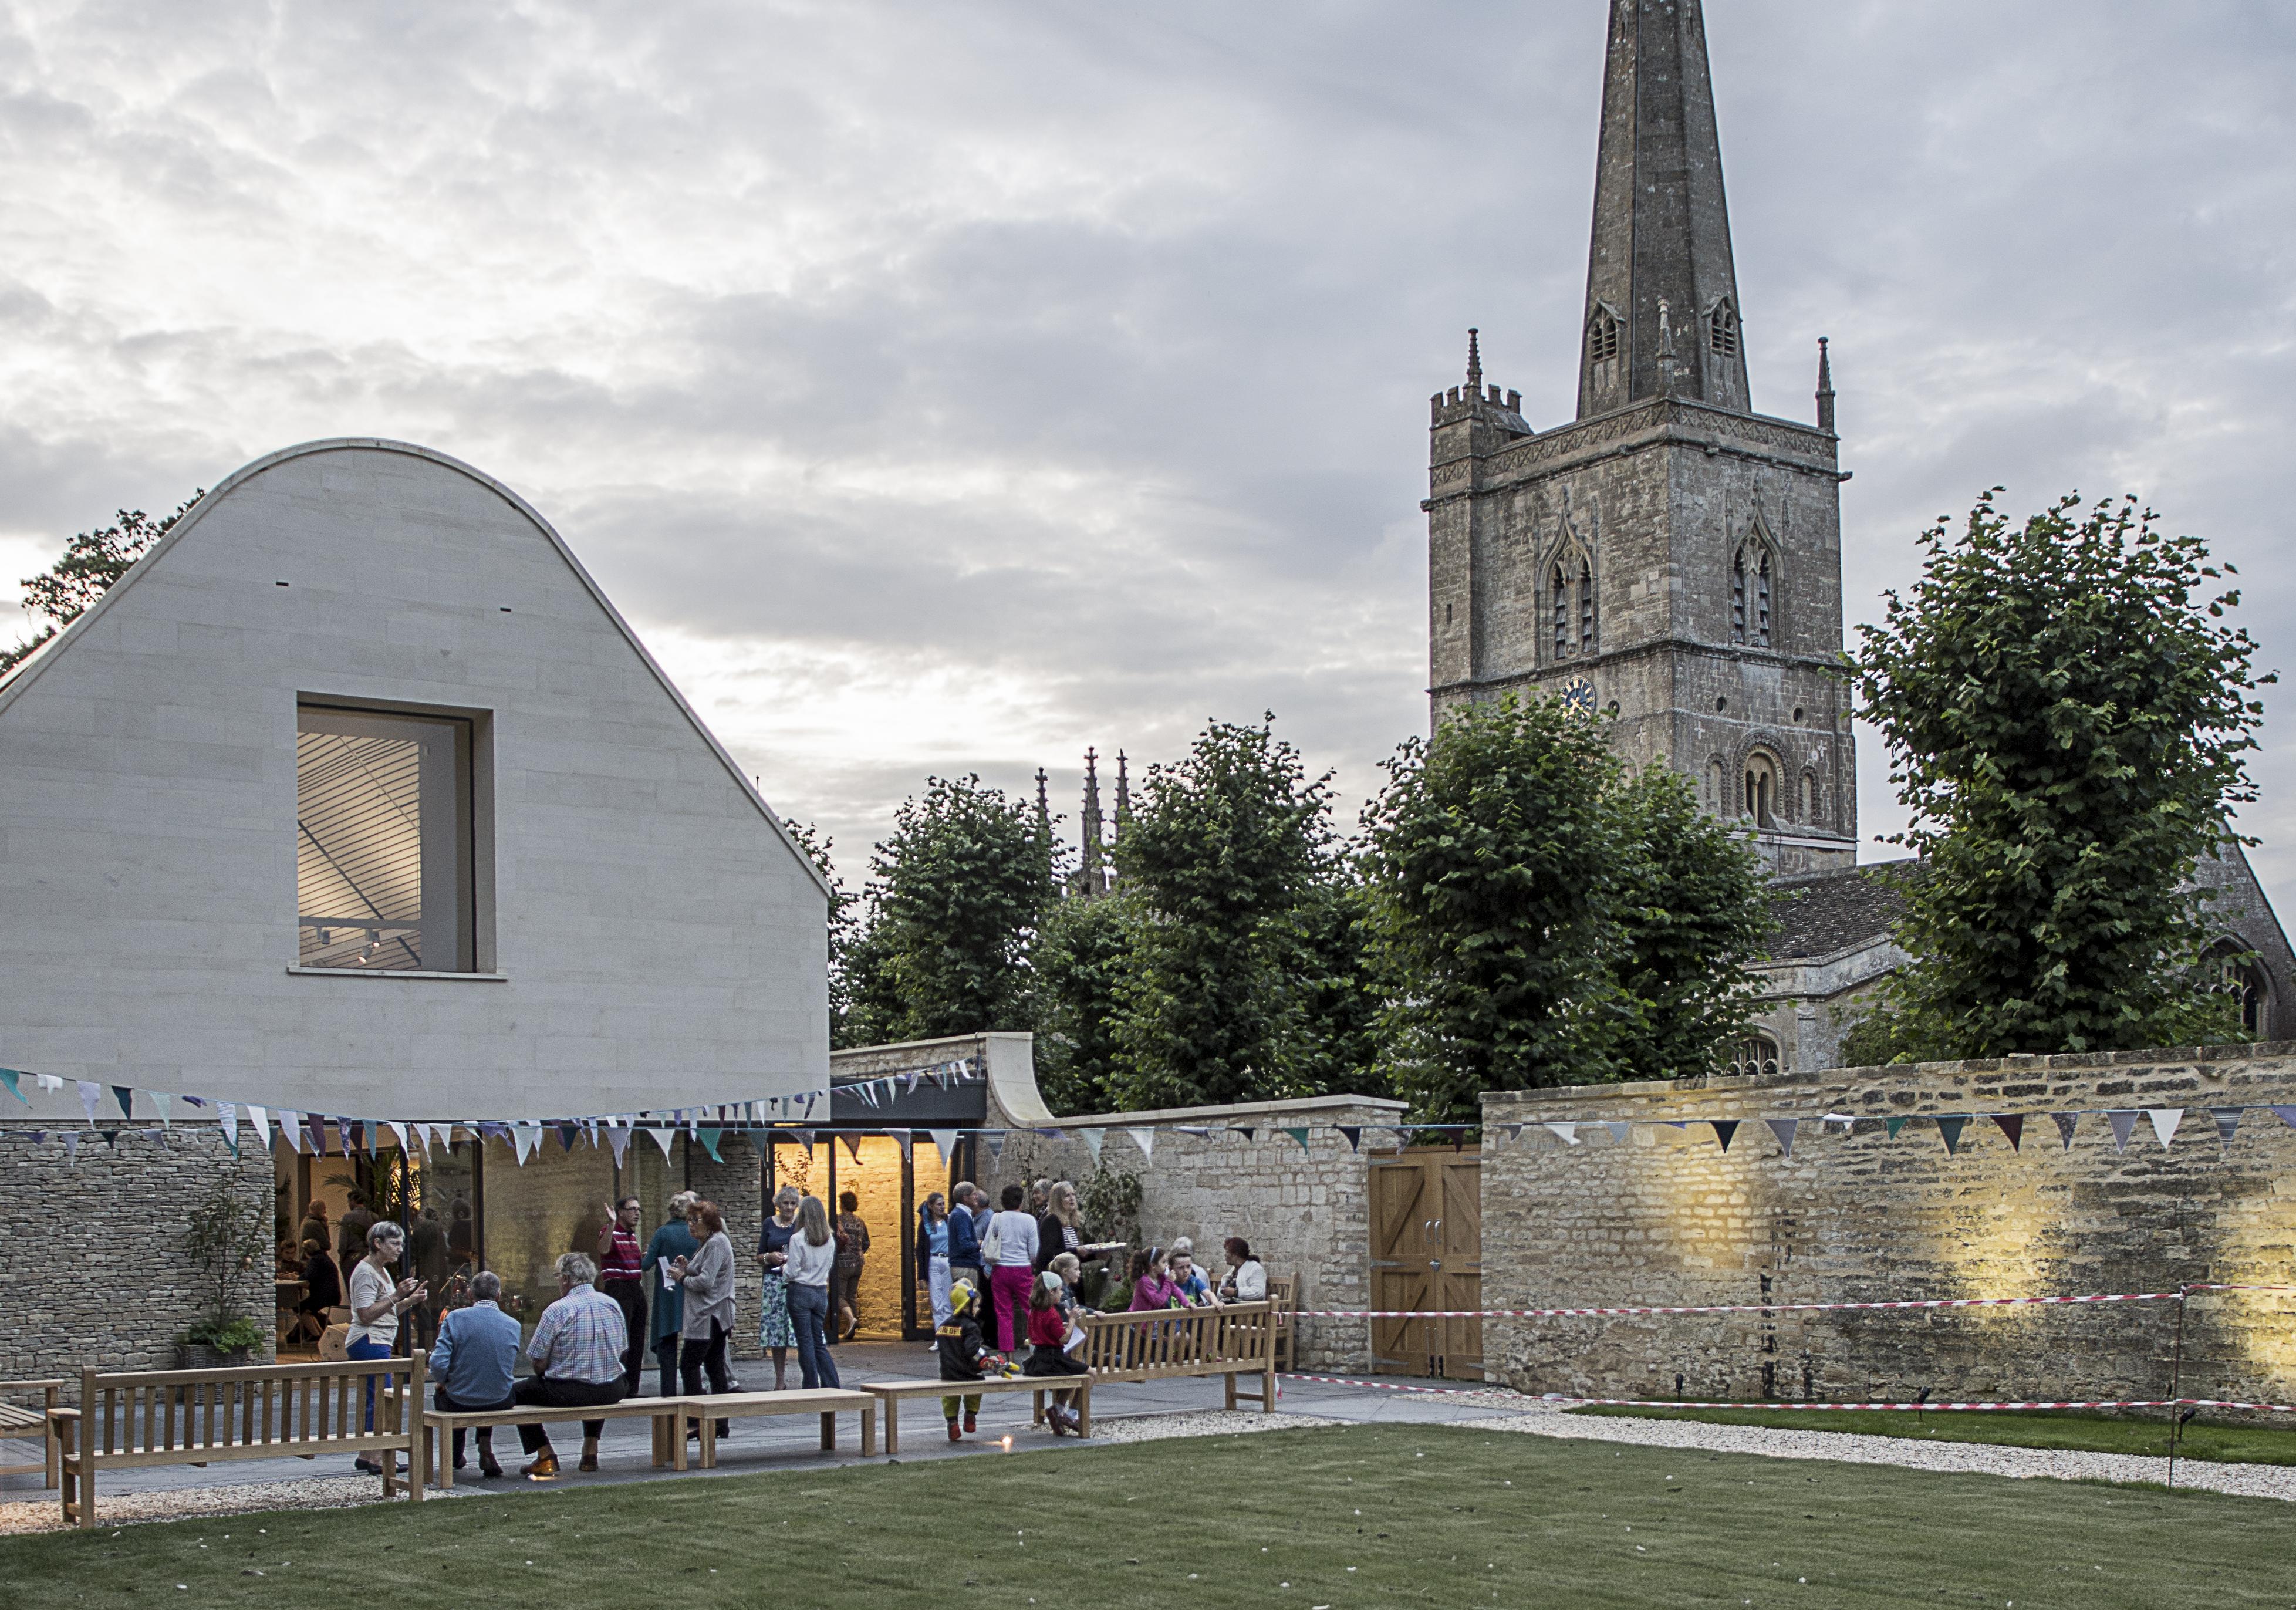 St John the Baptist, Burford, Oxfordshire